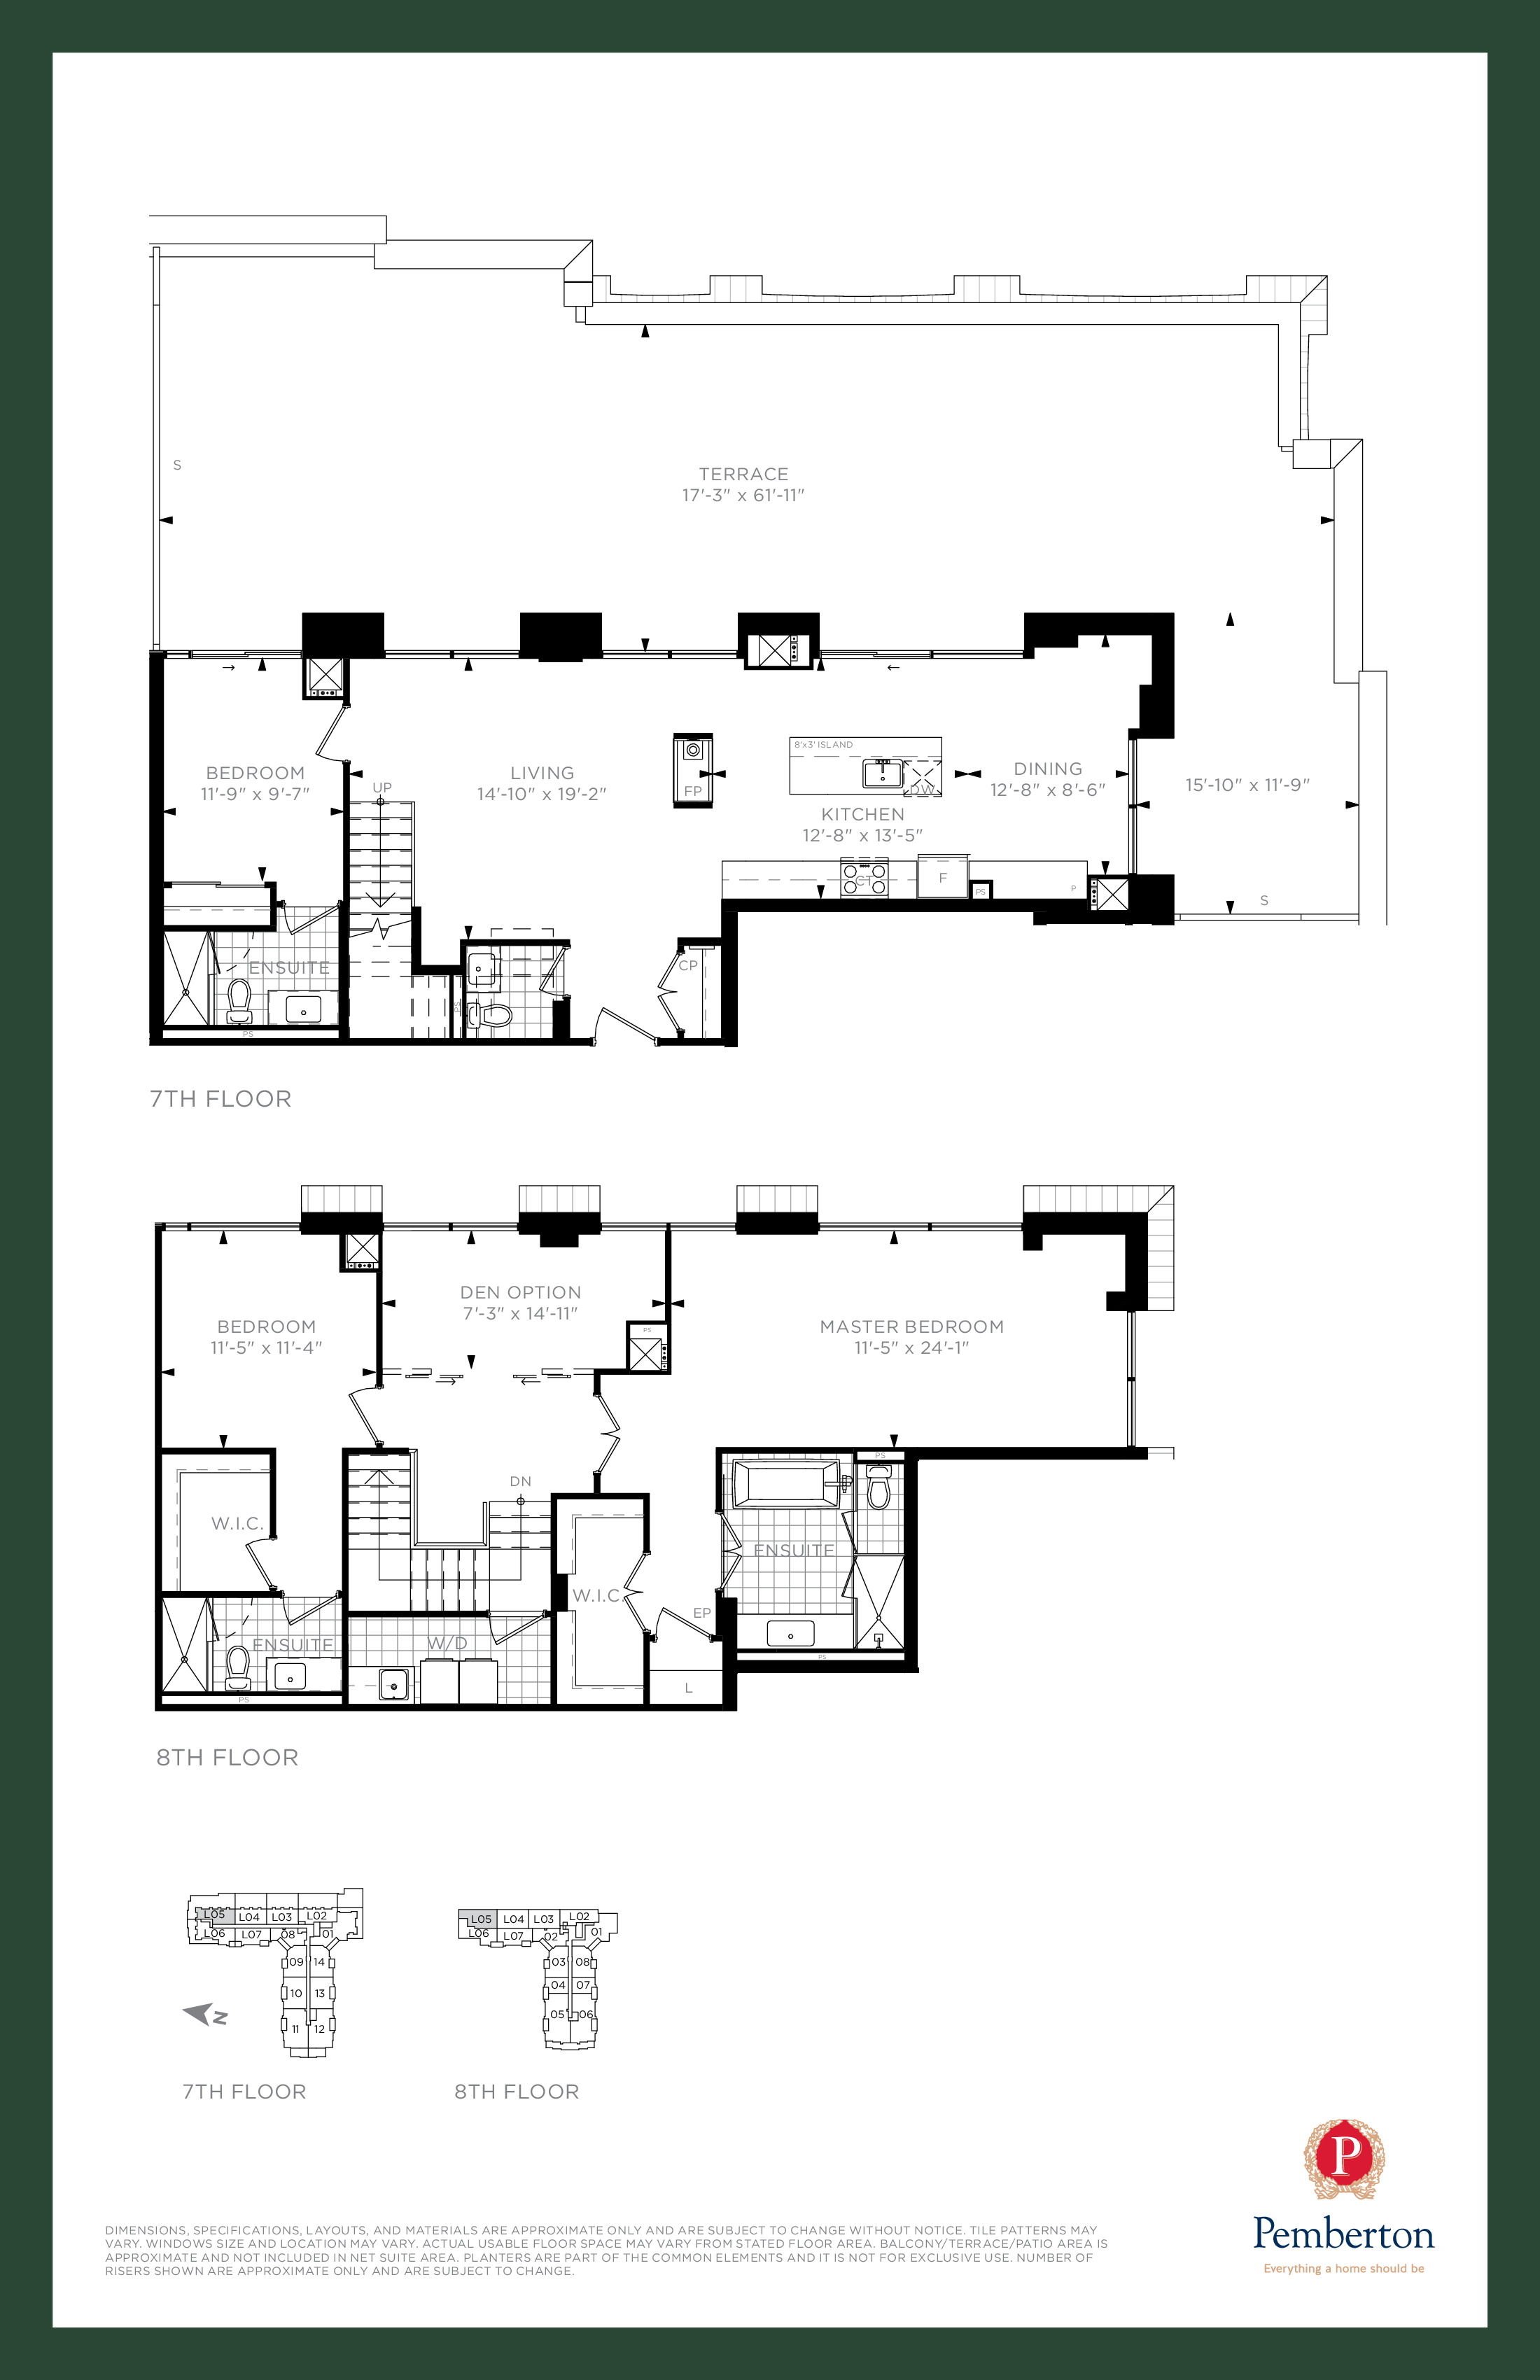 Loft C - Building A Floor Plan at 9th & Main Condos + Towns - 2185 sq.ft